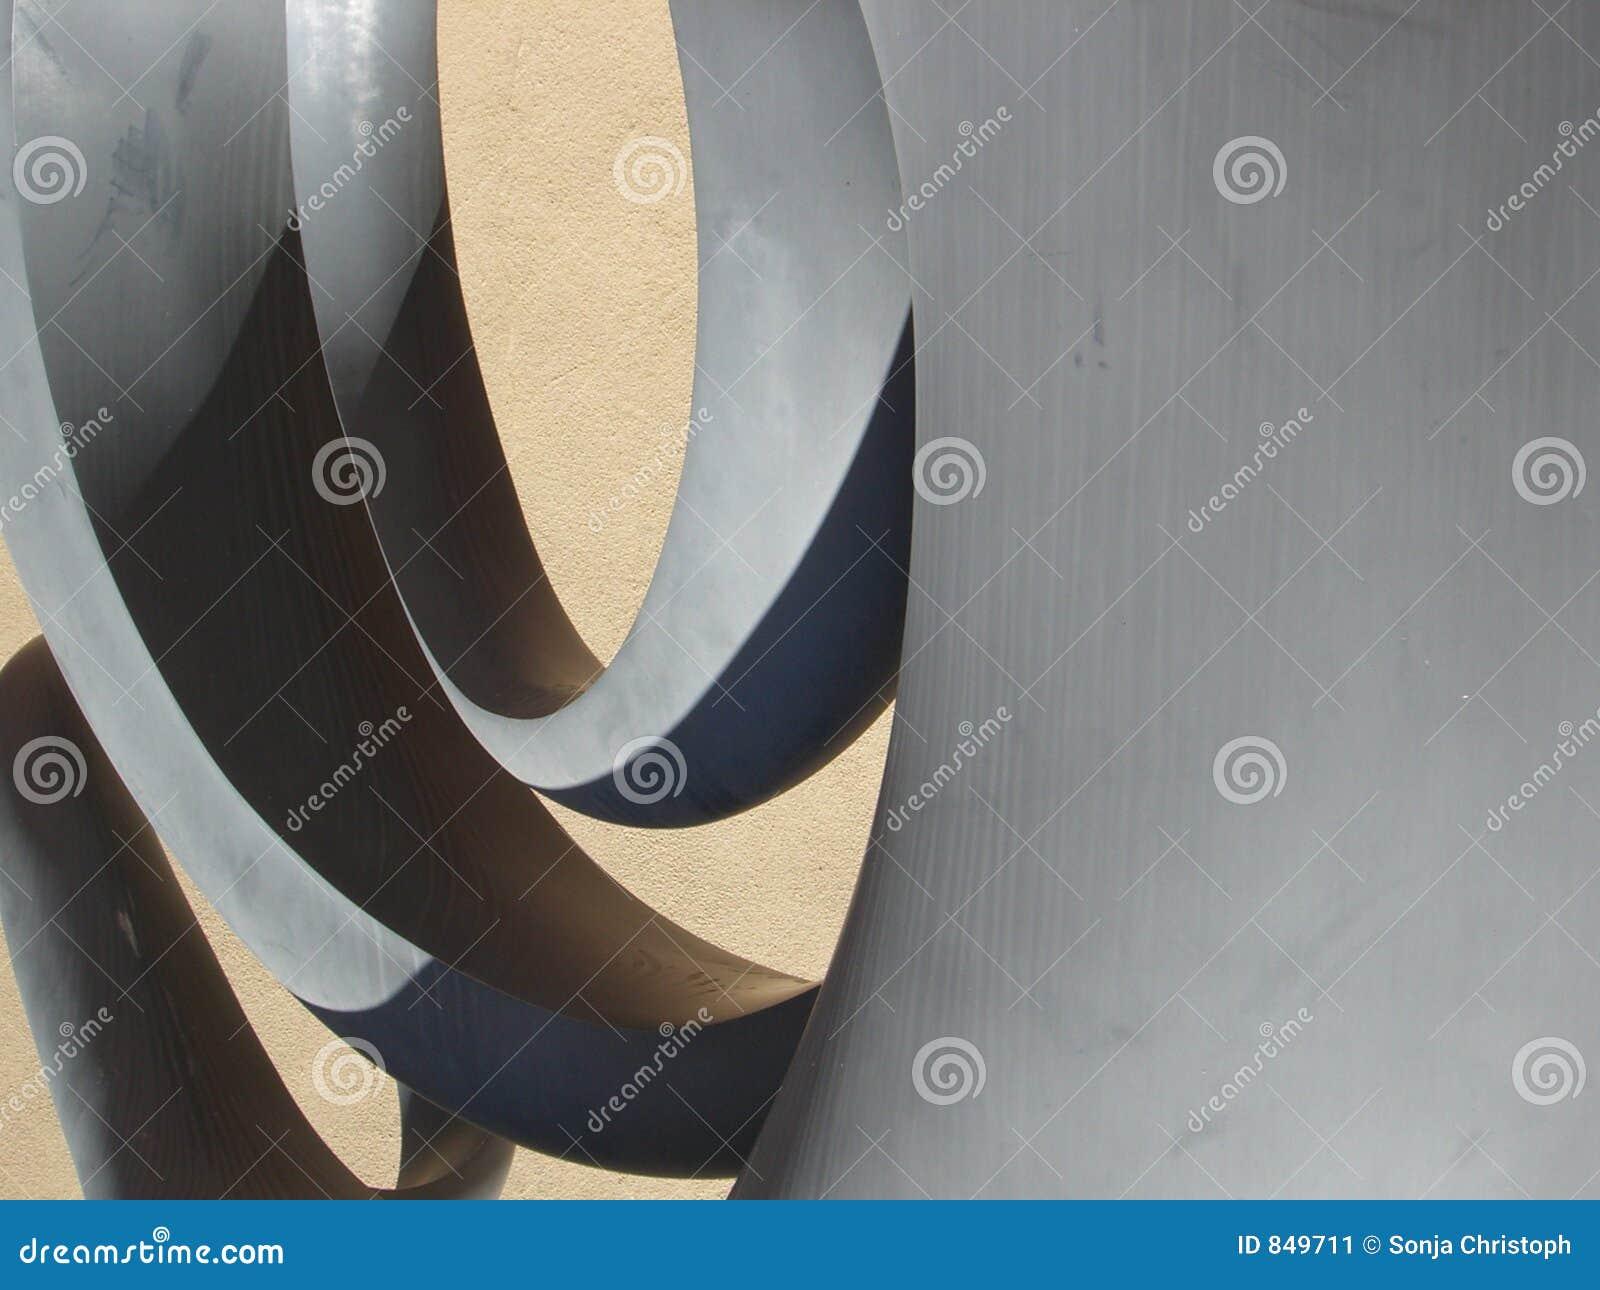 Formes dans la sculpture II